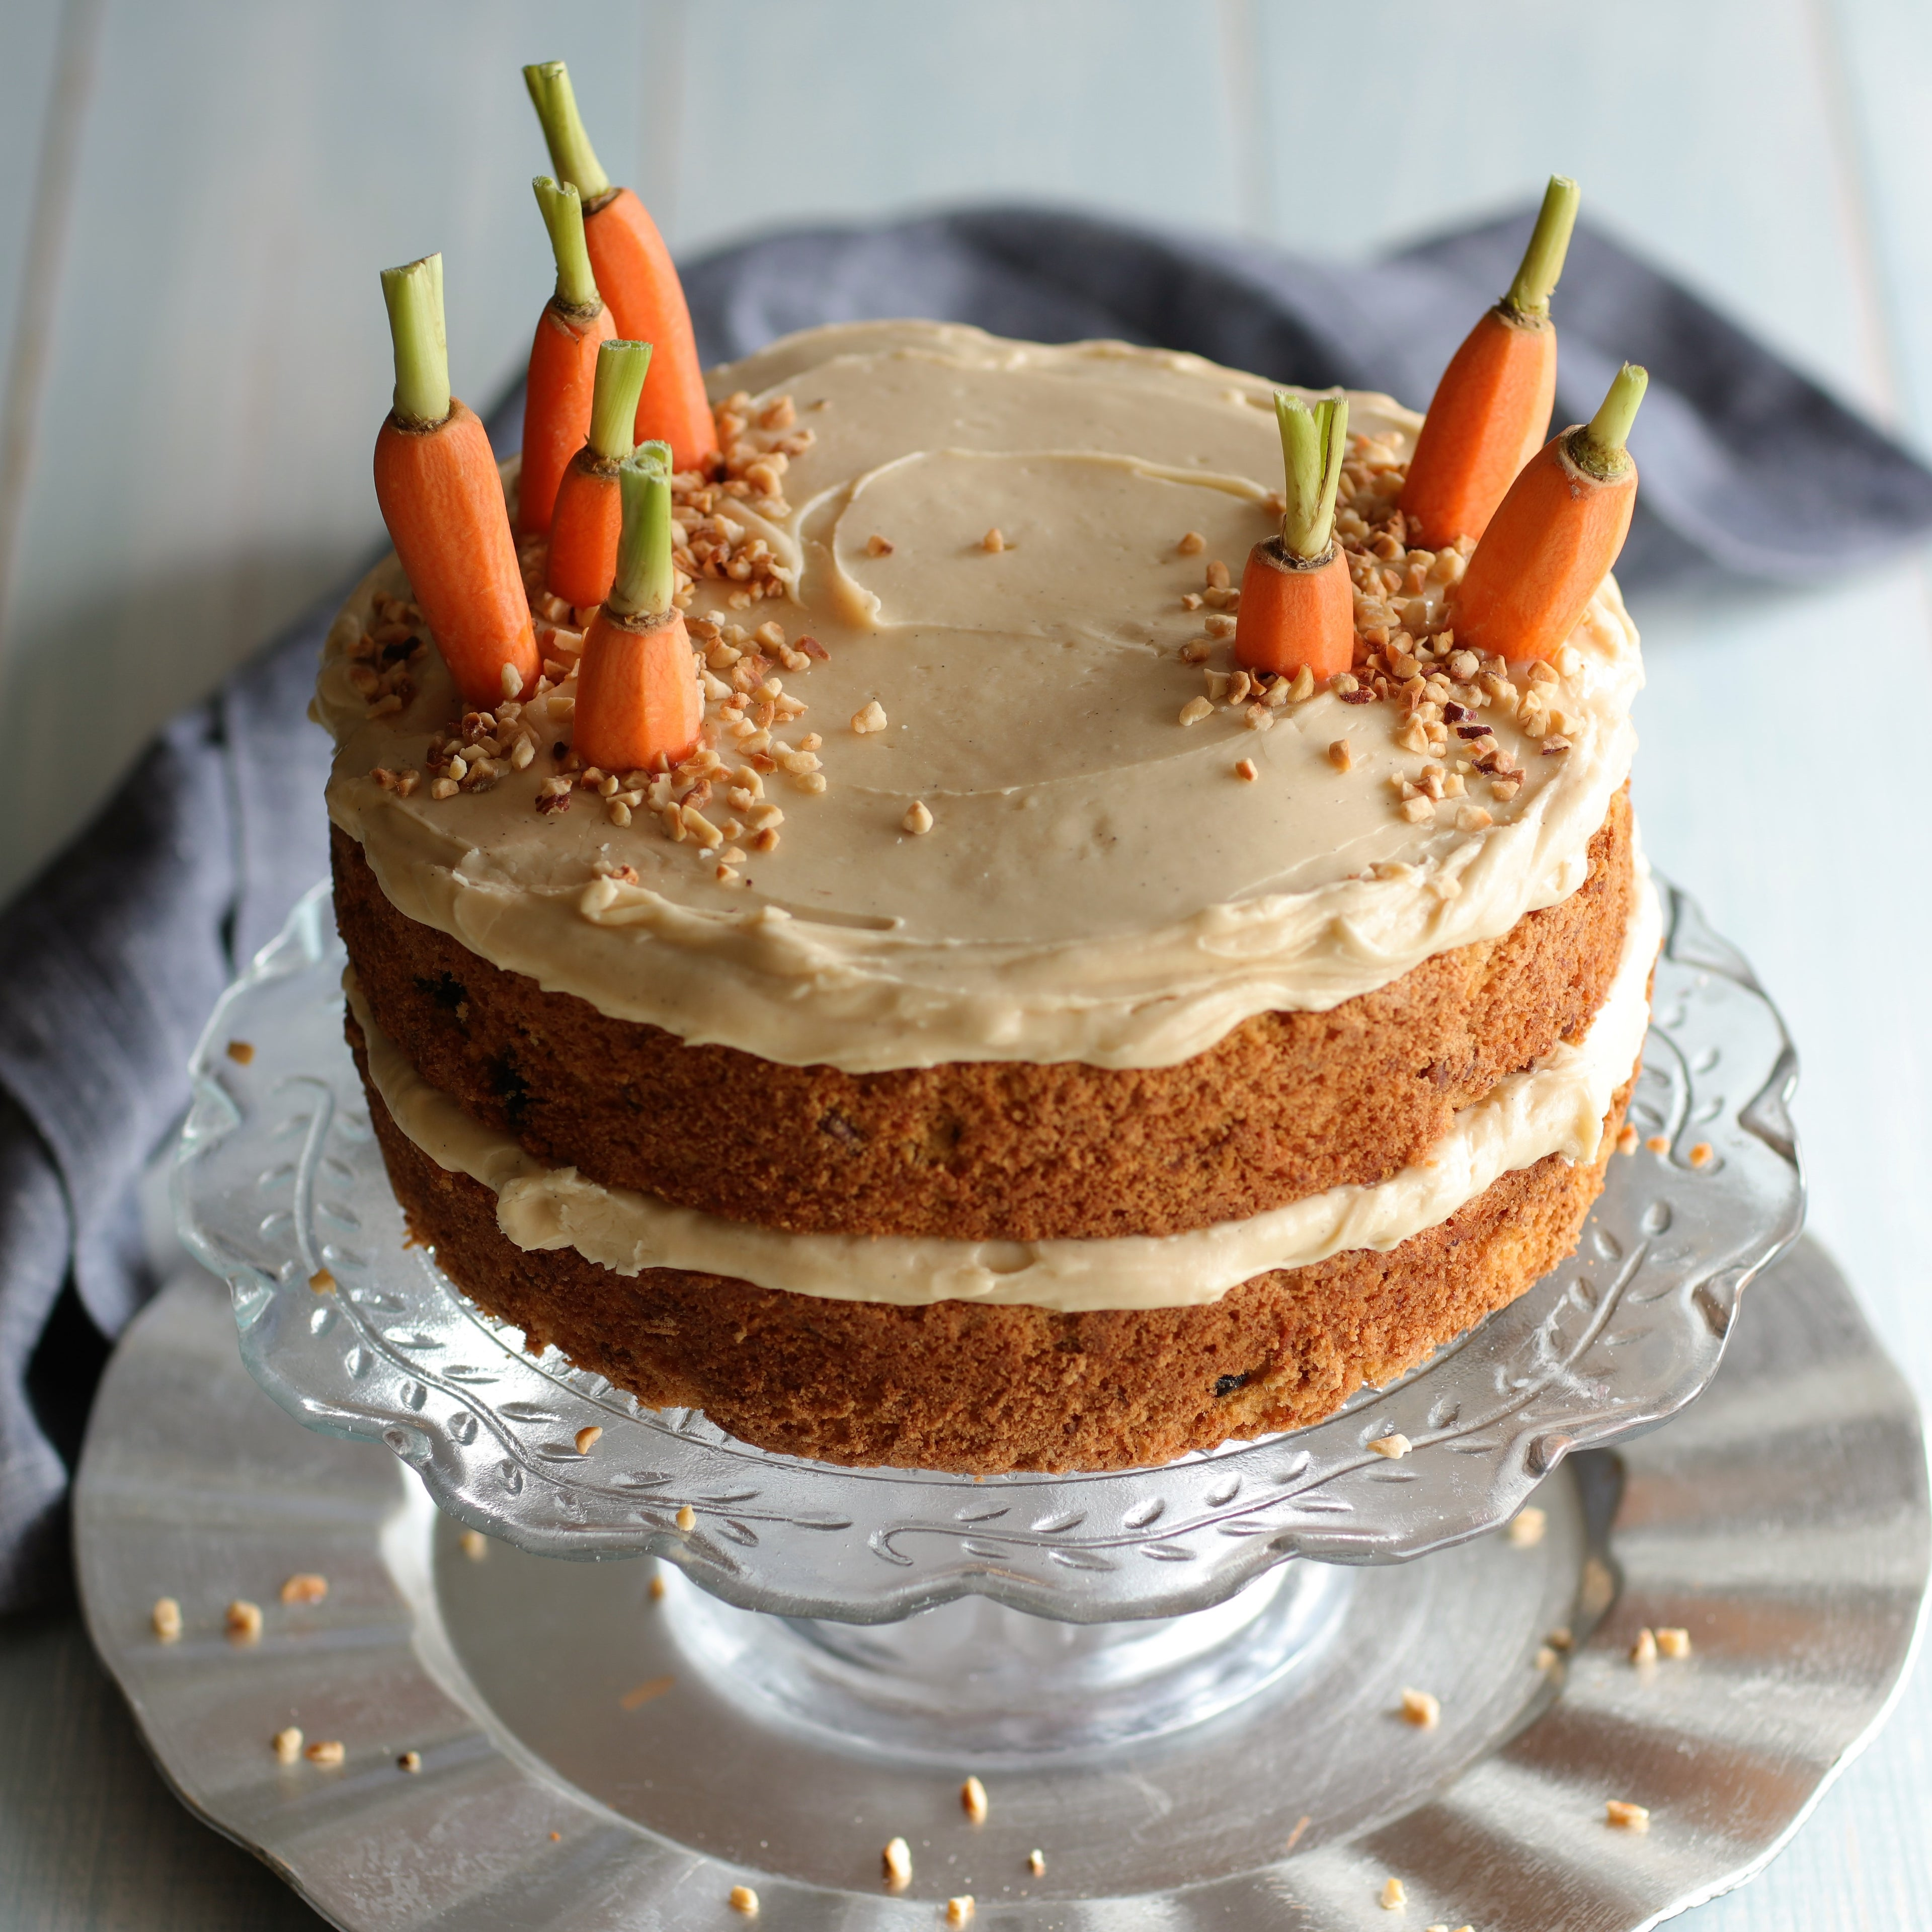 Nielsen-Massey-Carrot-cake-with-vanilla-bean-icing.JPG